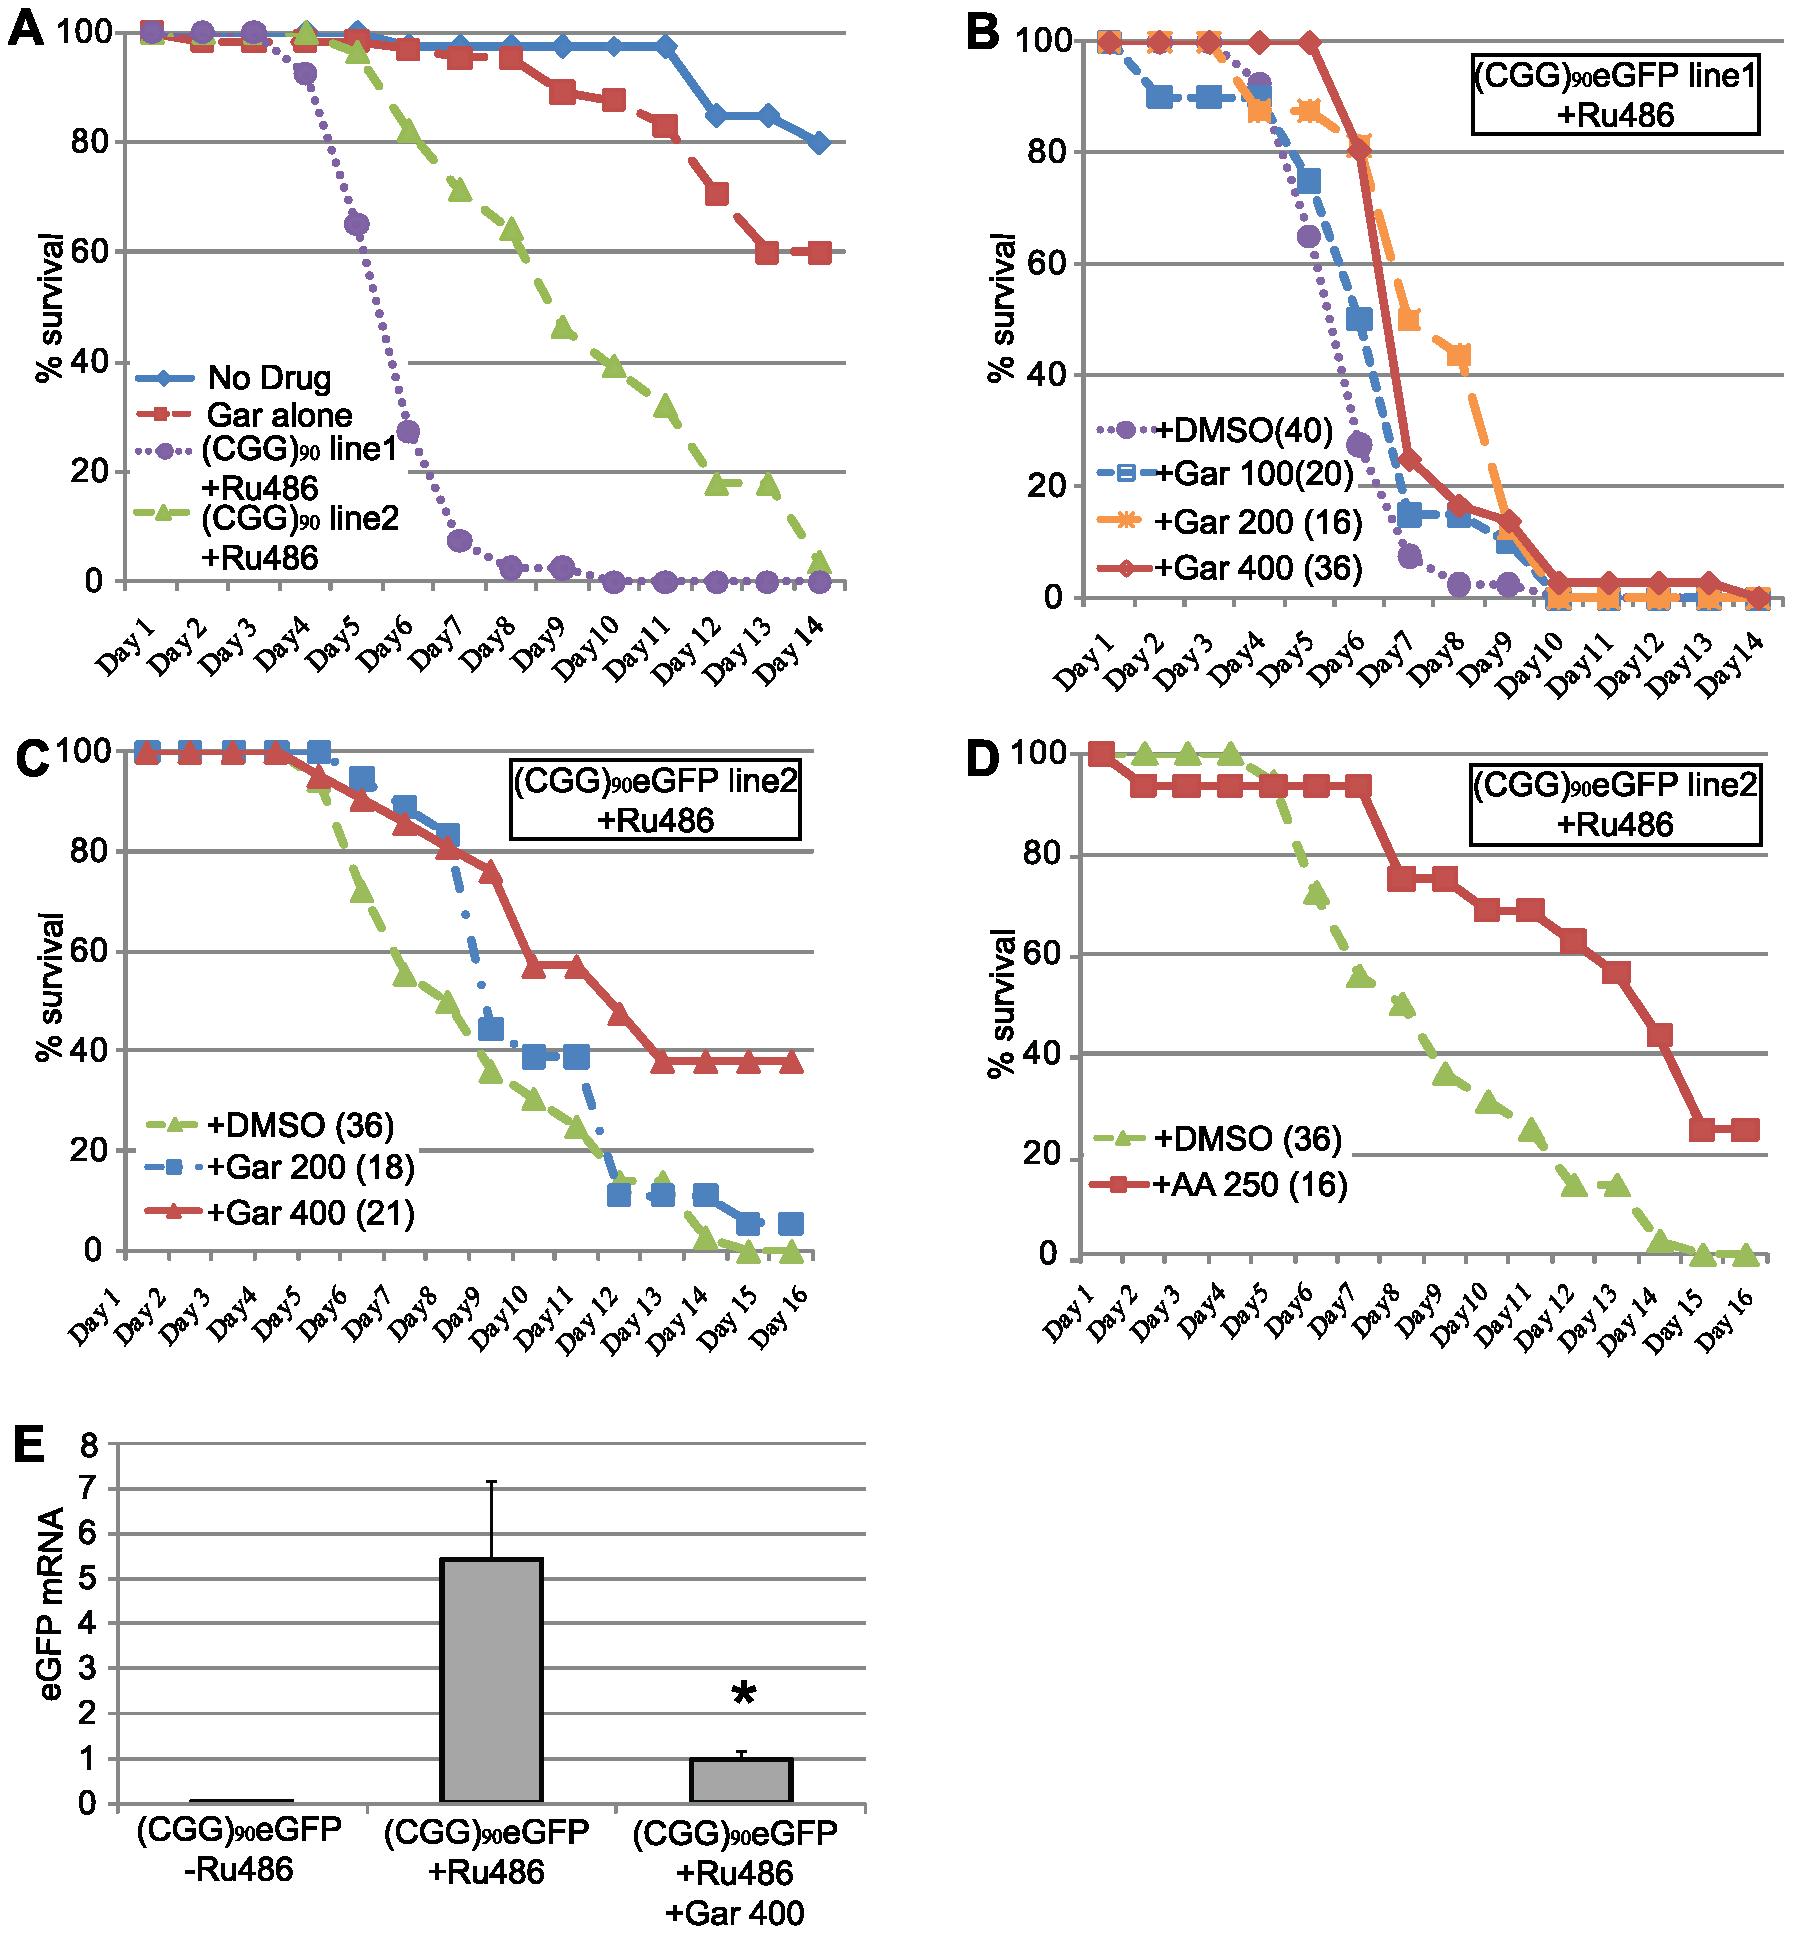 HAT inhibitors extend lifespan in adult (CGG)<sub>90</sub>-eGFP flies.